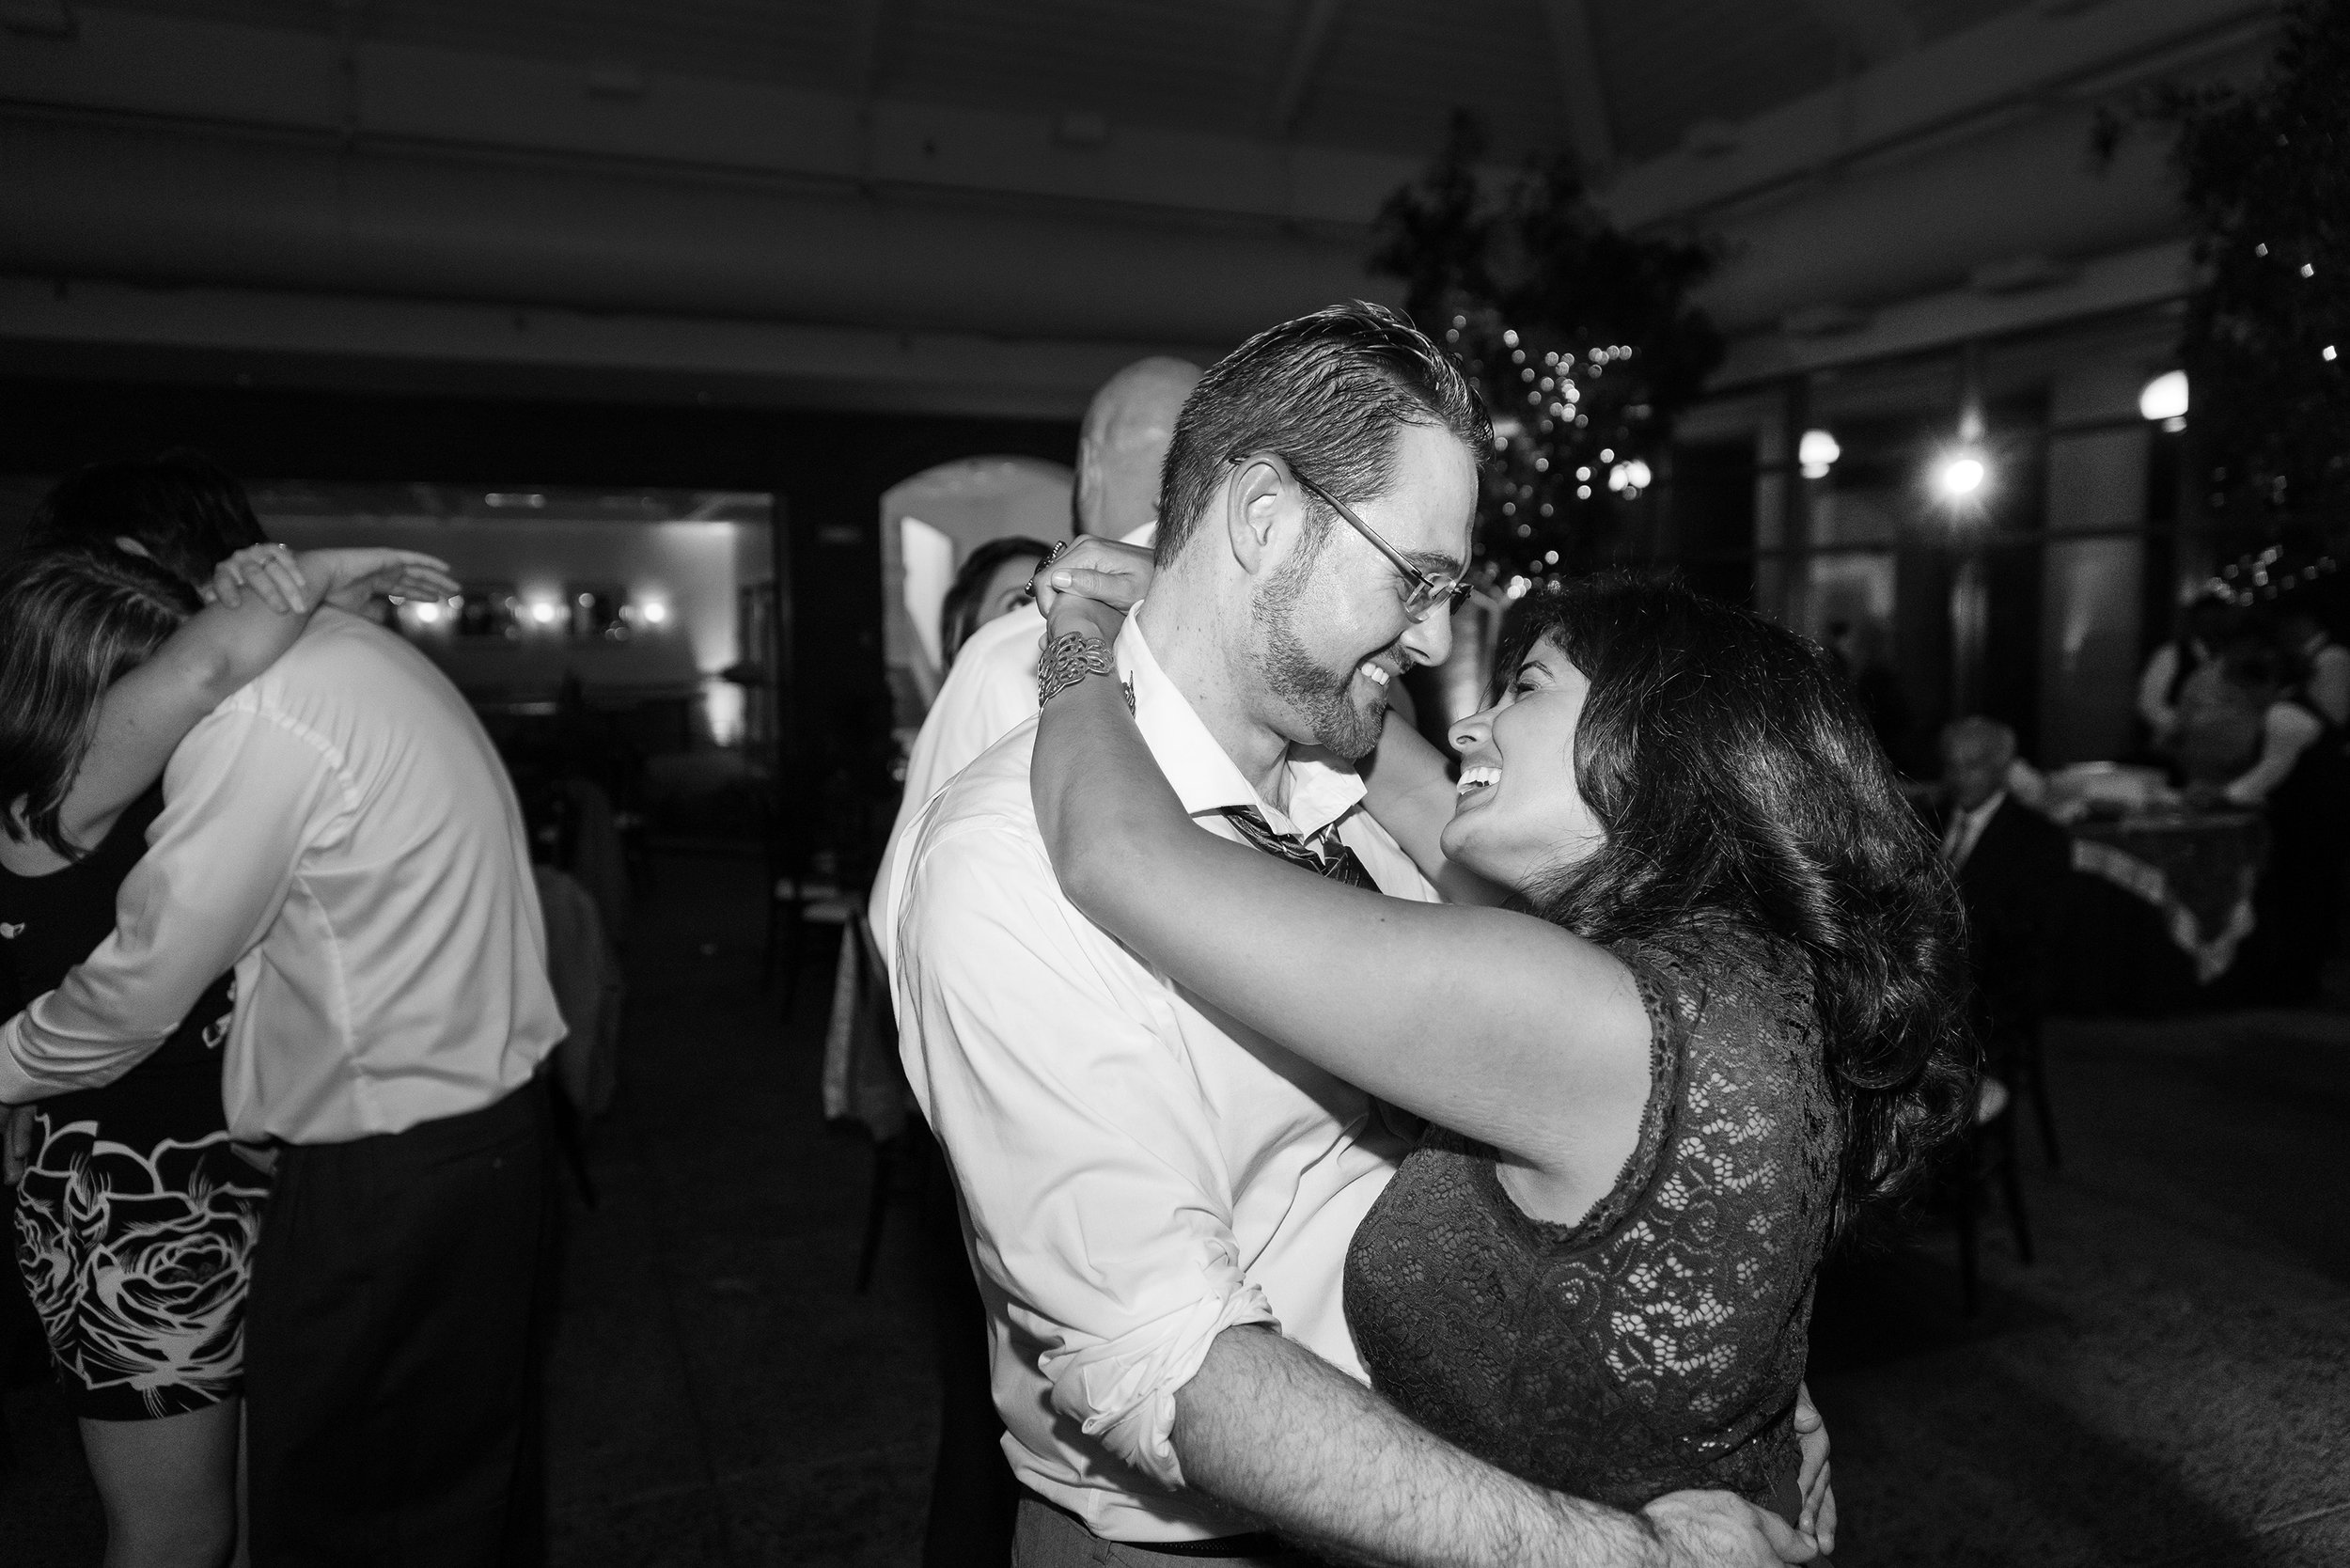 Dance floor at meadowlark botanical garden wedding reception